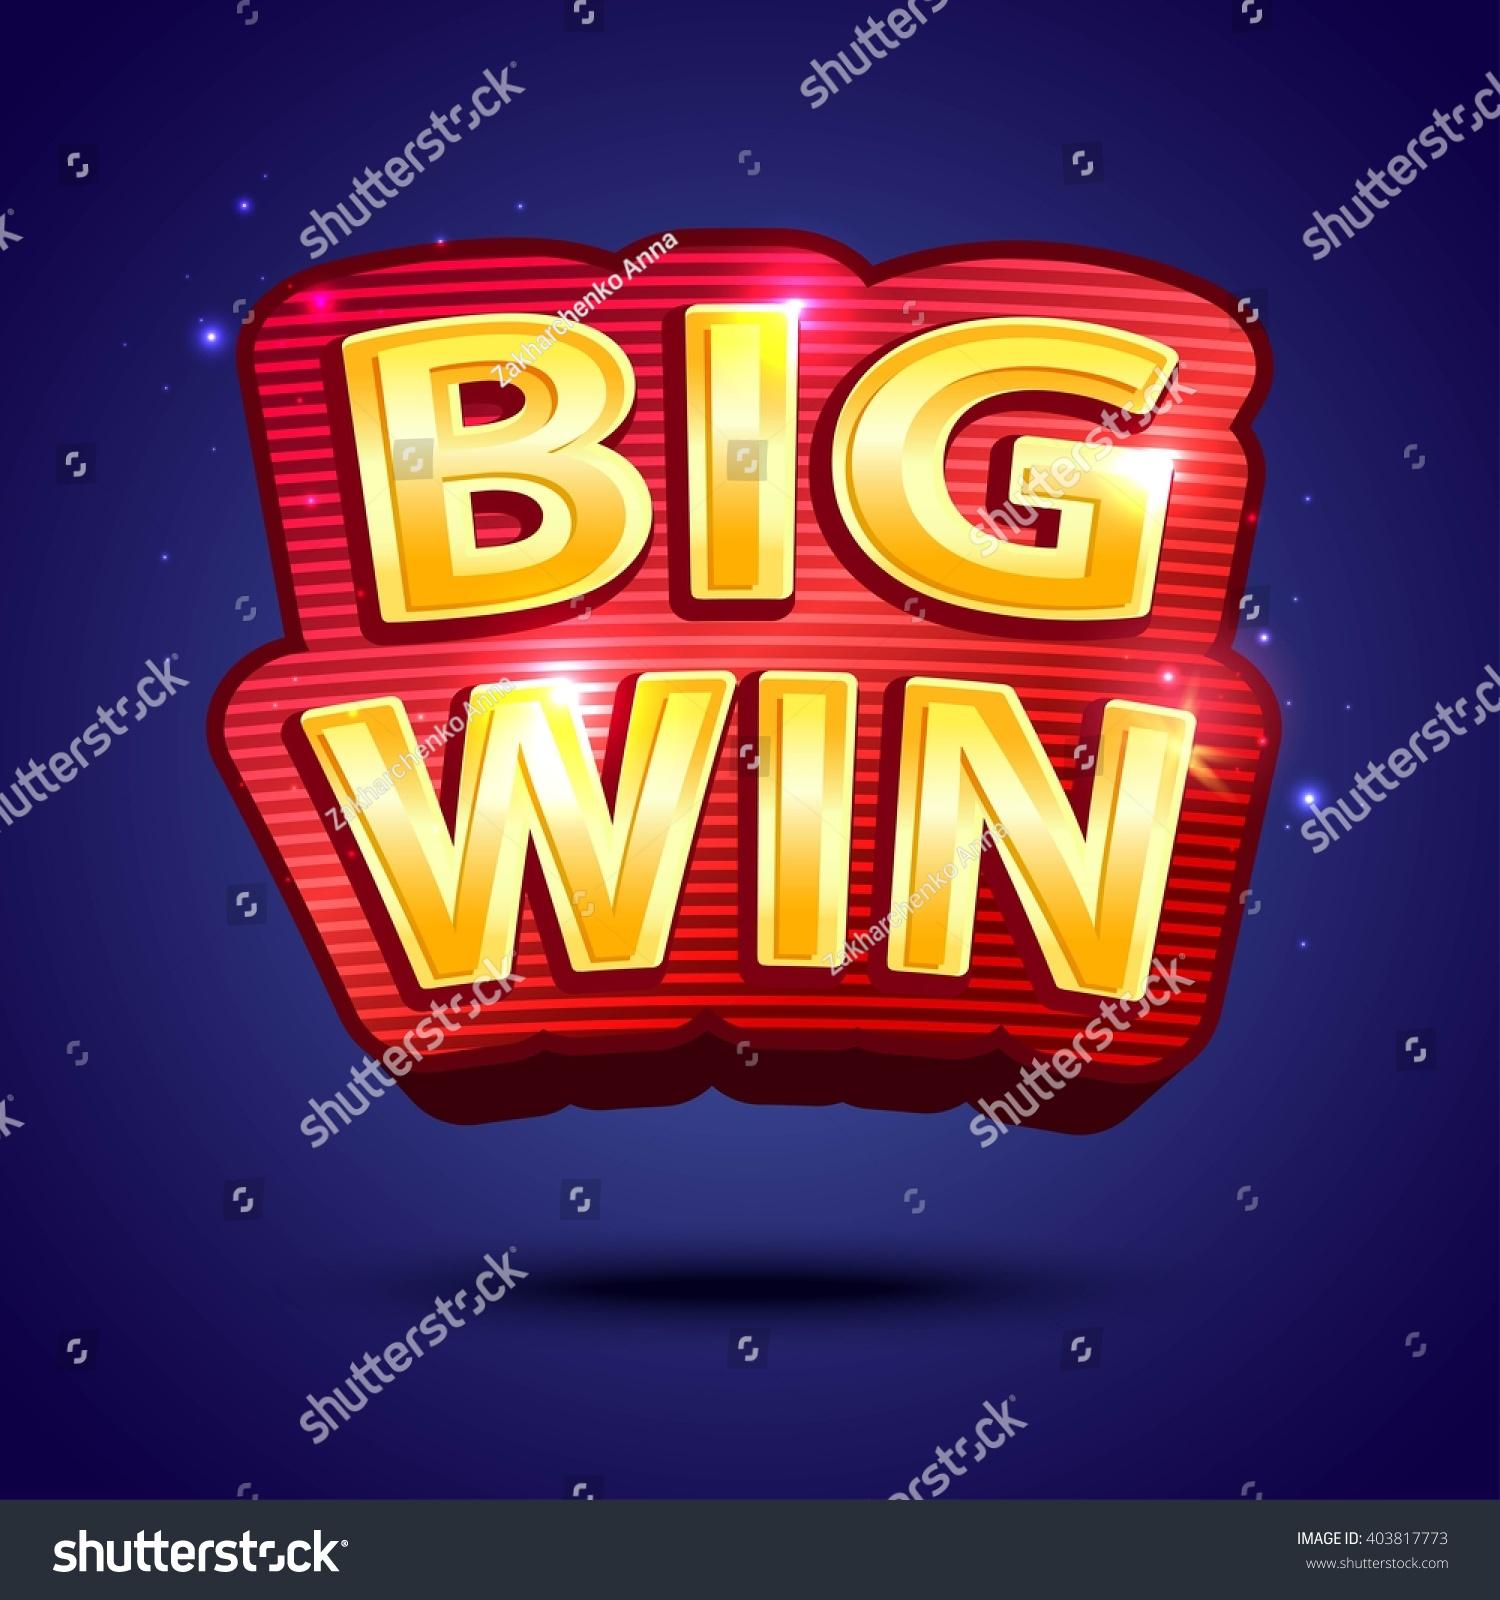 Design large banner in illustrator - Big Win Banner For Online Casino Poker Roulette Slot Machines Card Games